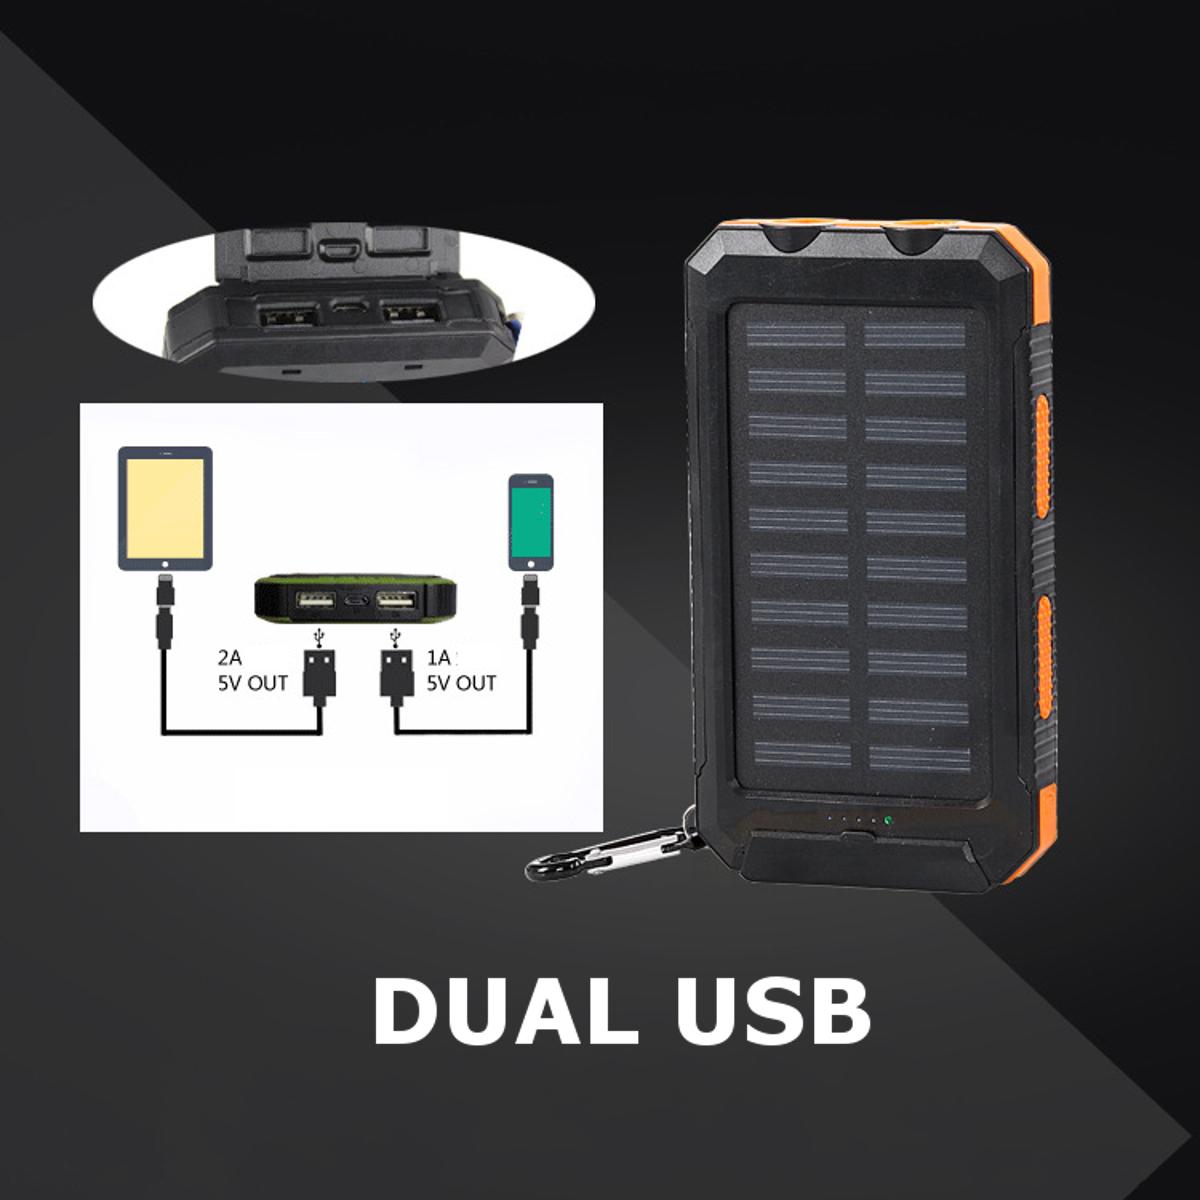 Bakeey LED Flashight 10000mAh Dual USB Солнечная Energy DIY Банк питания Батарея Чехол Для планшета мобильного телефона - фото 2